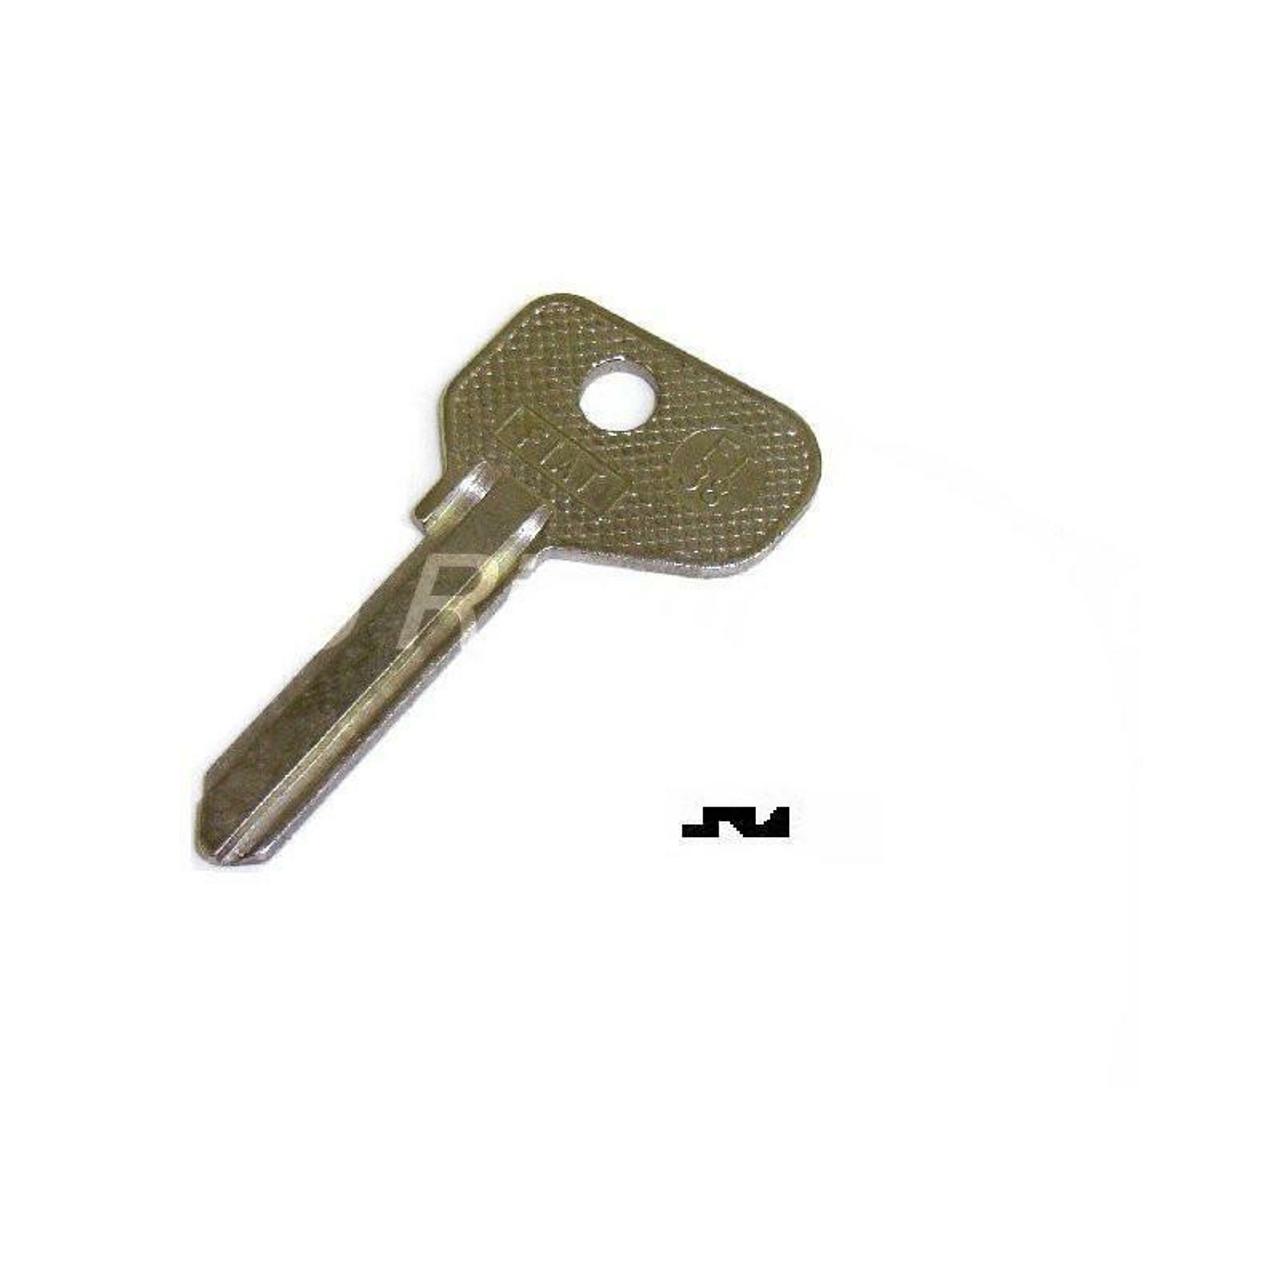 Single Sided Key Blank Series #3